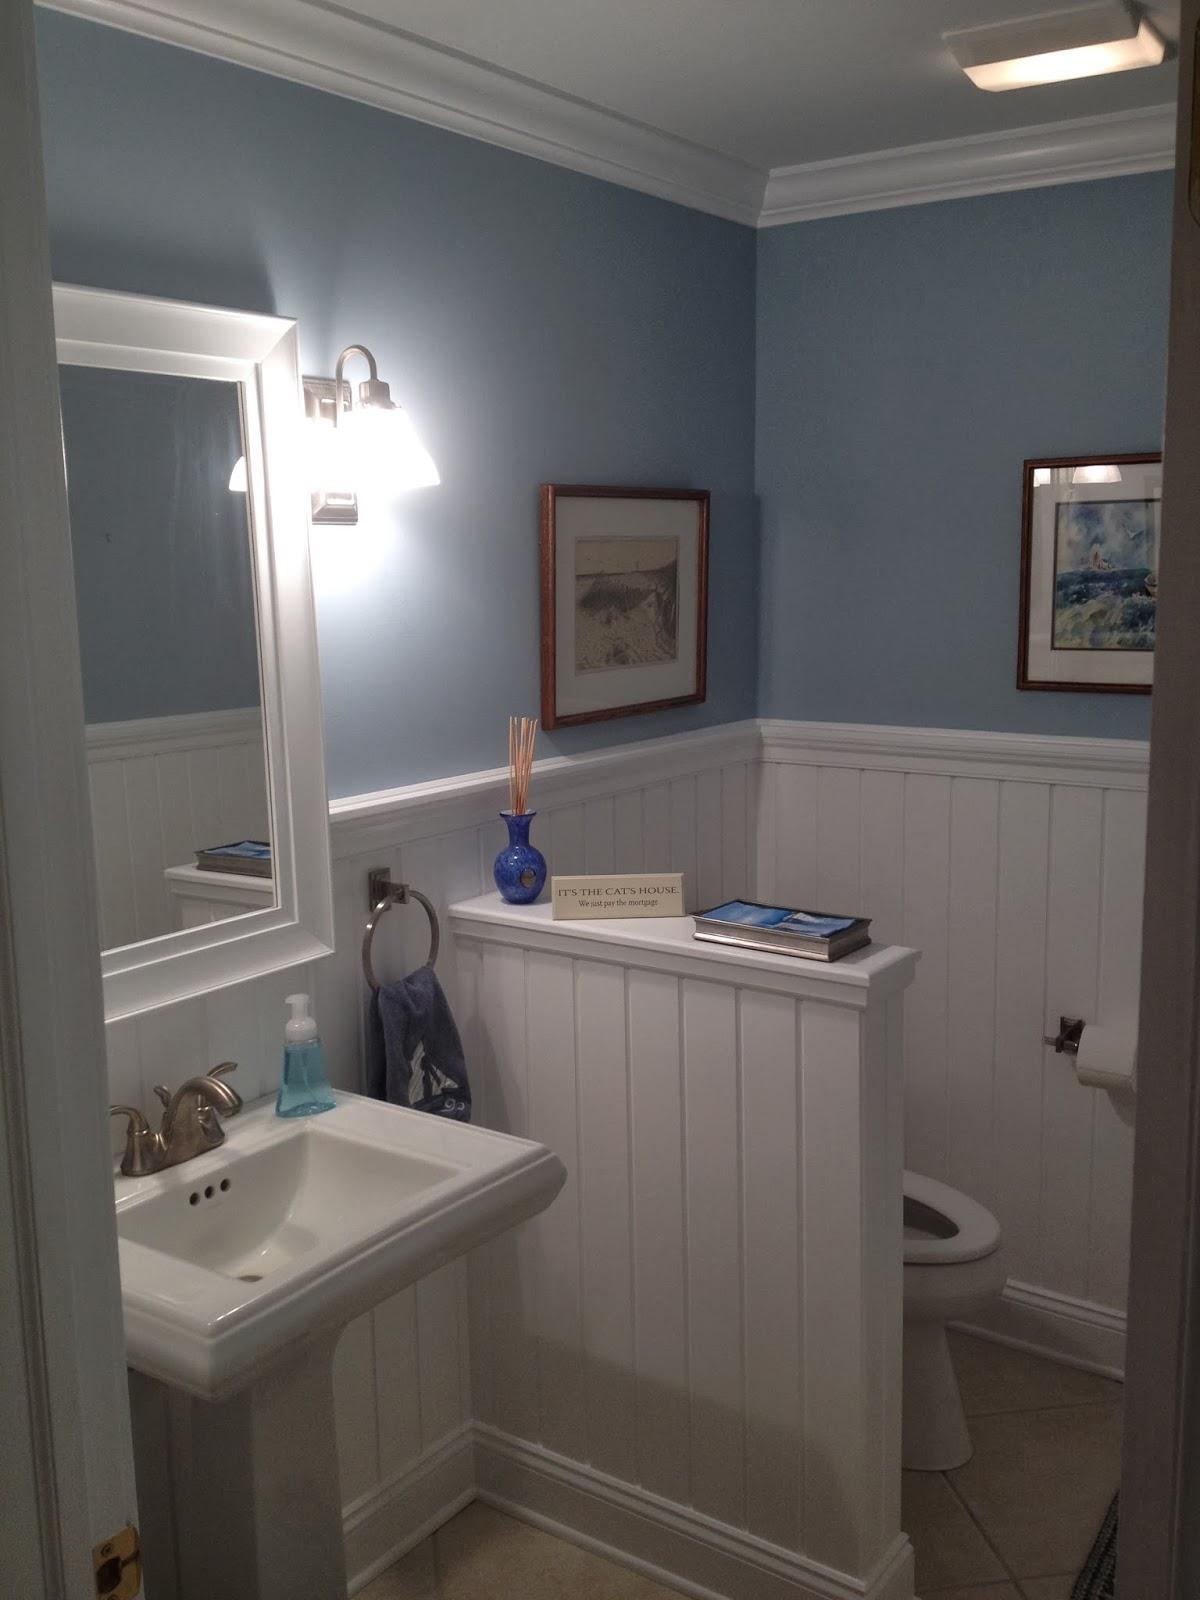 Contemporary bathroom renovation flawless carpentry for Contemporary bathroom renovations